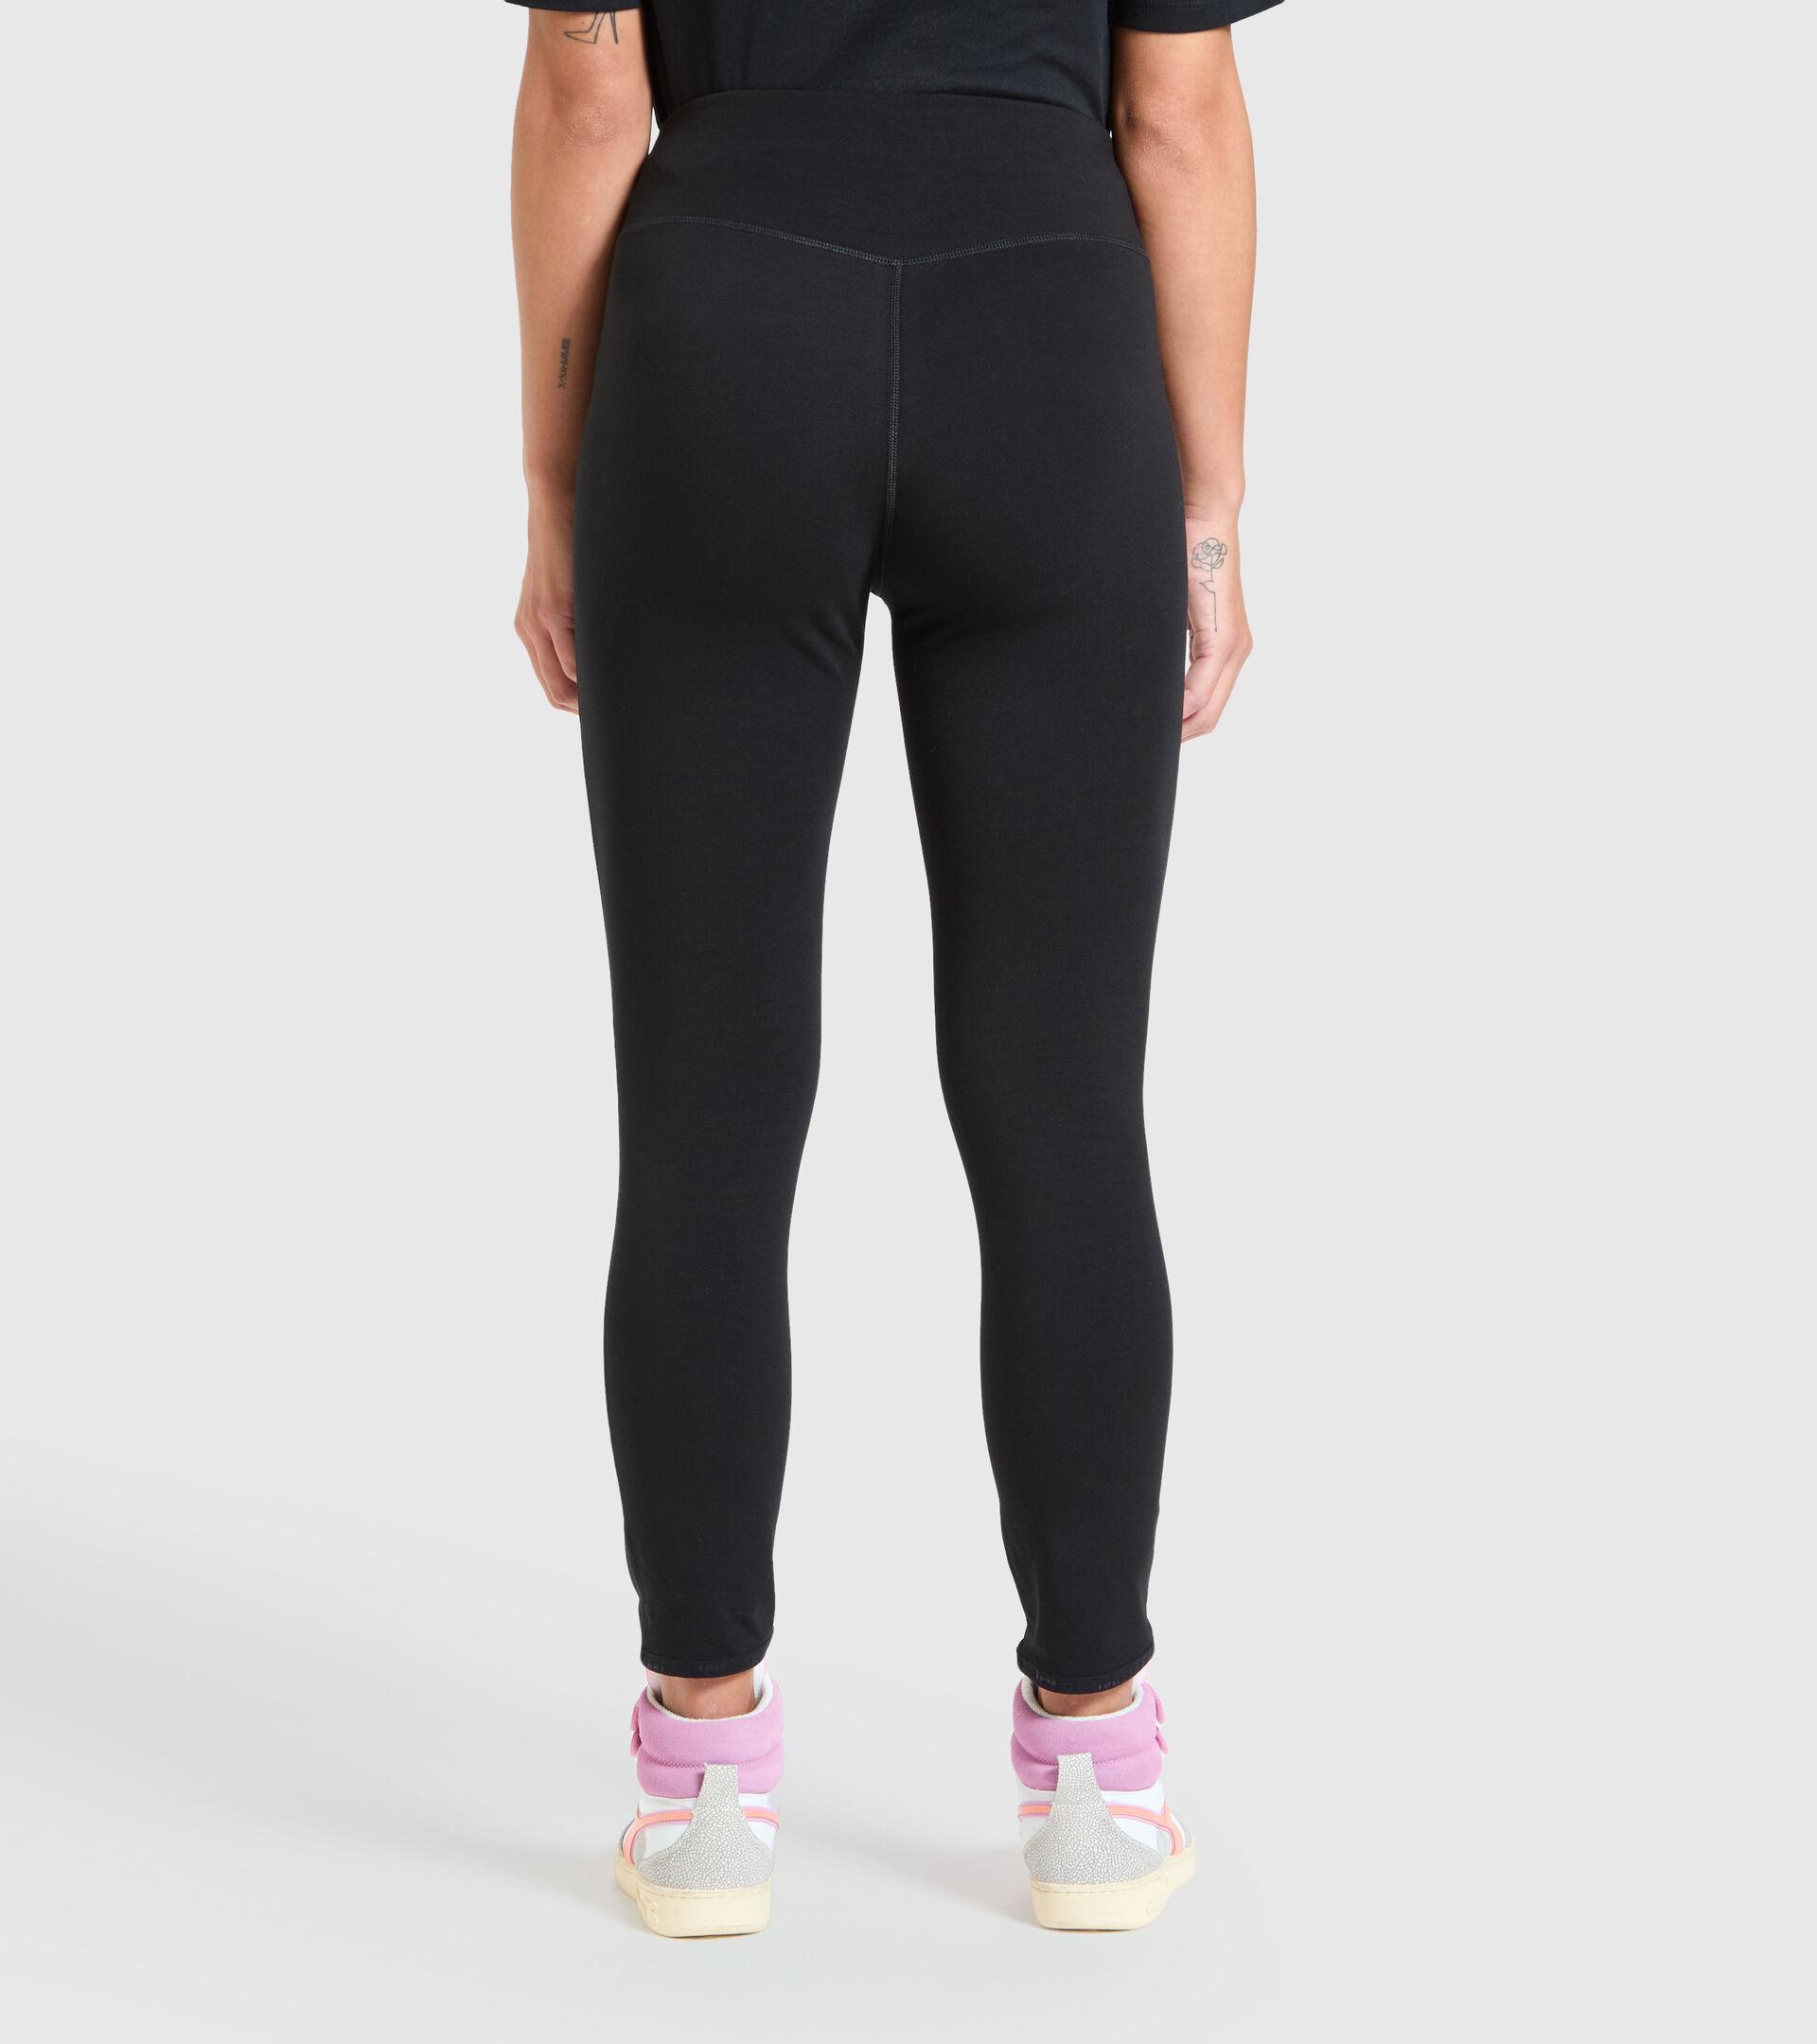 Sports leggings - Women  L. LEGGINGS URBANITY BLACK - Diadora